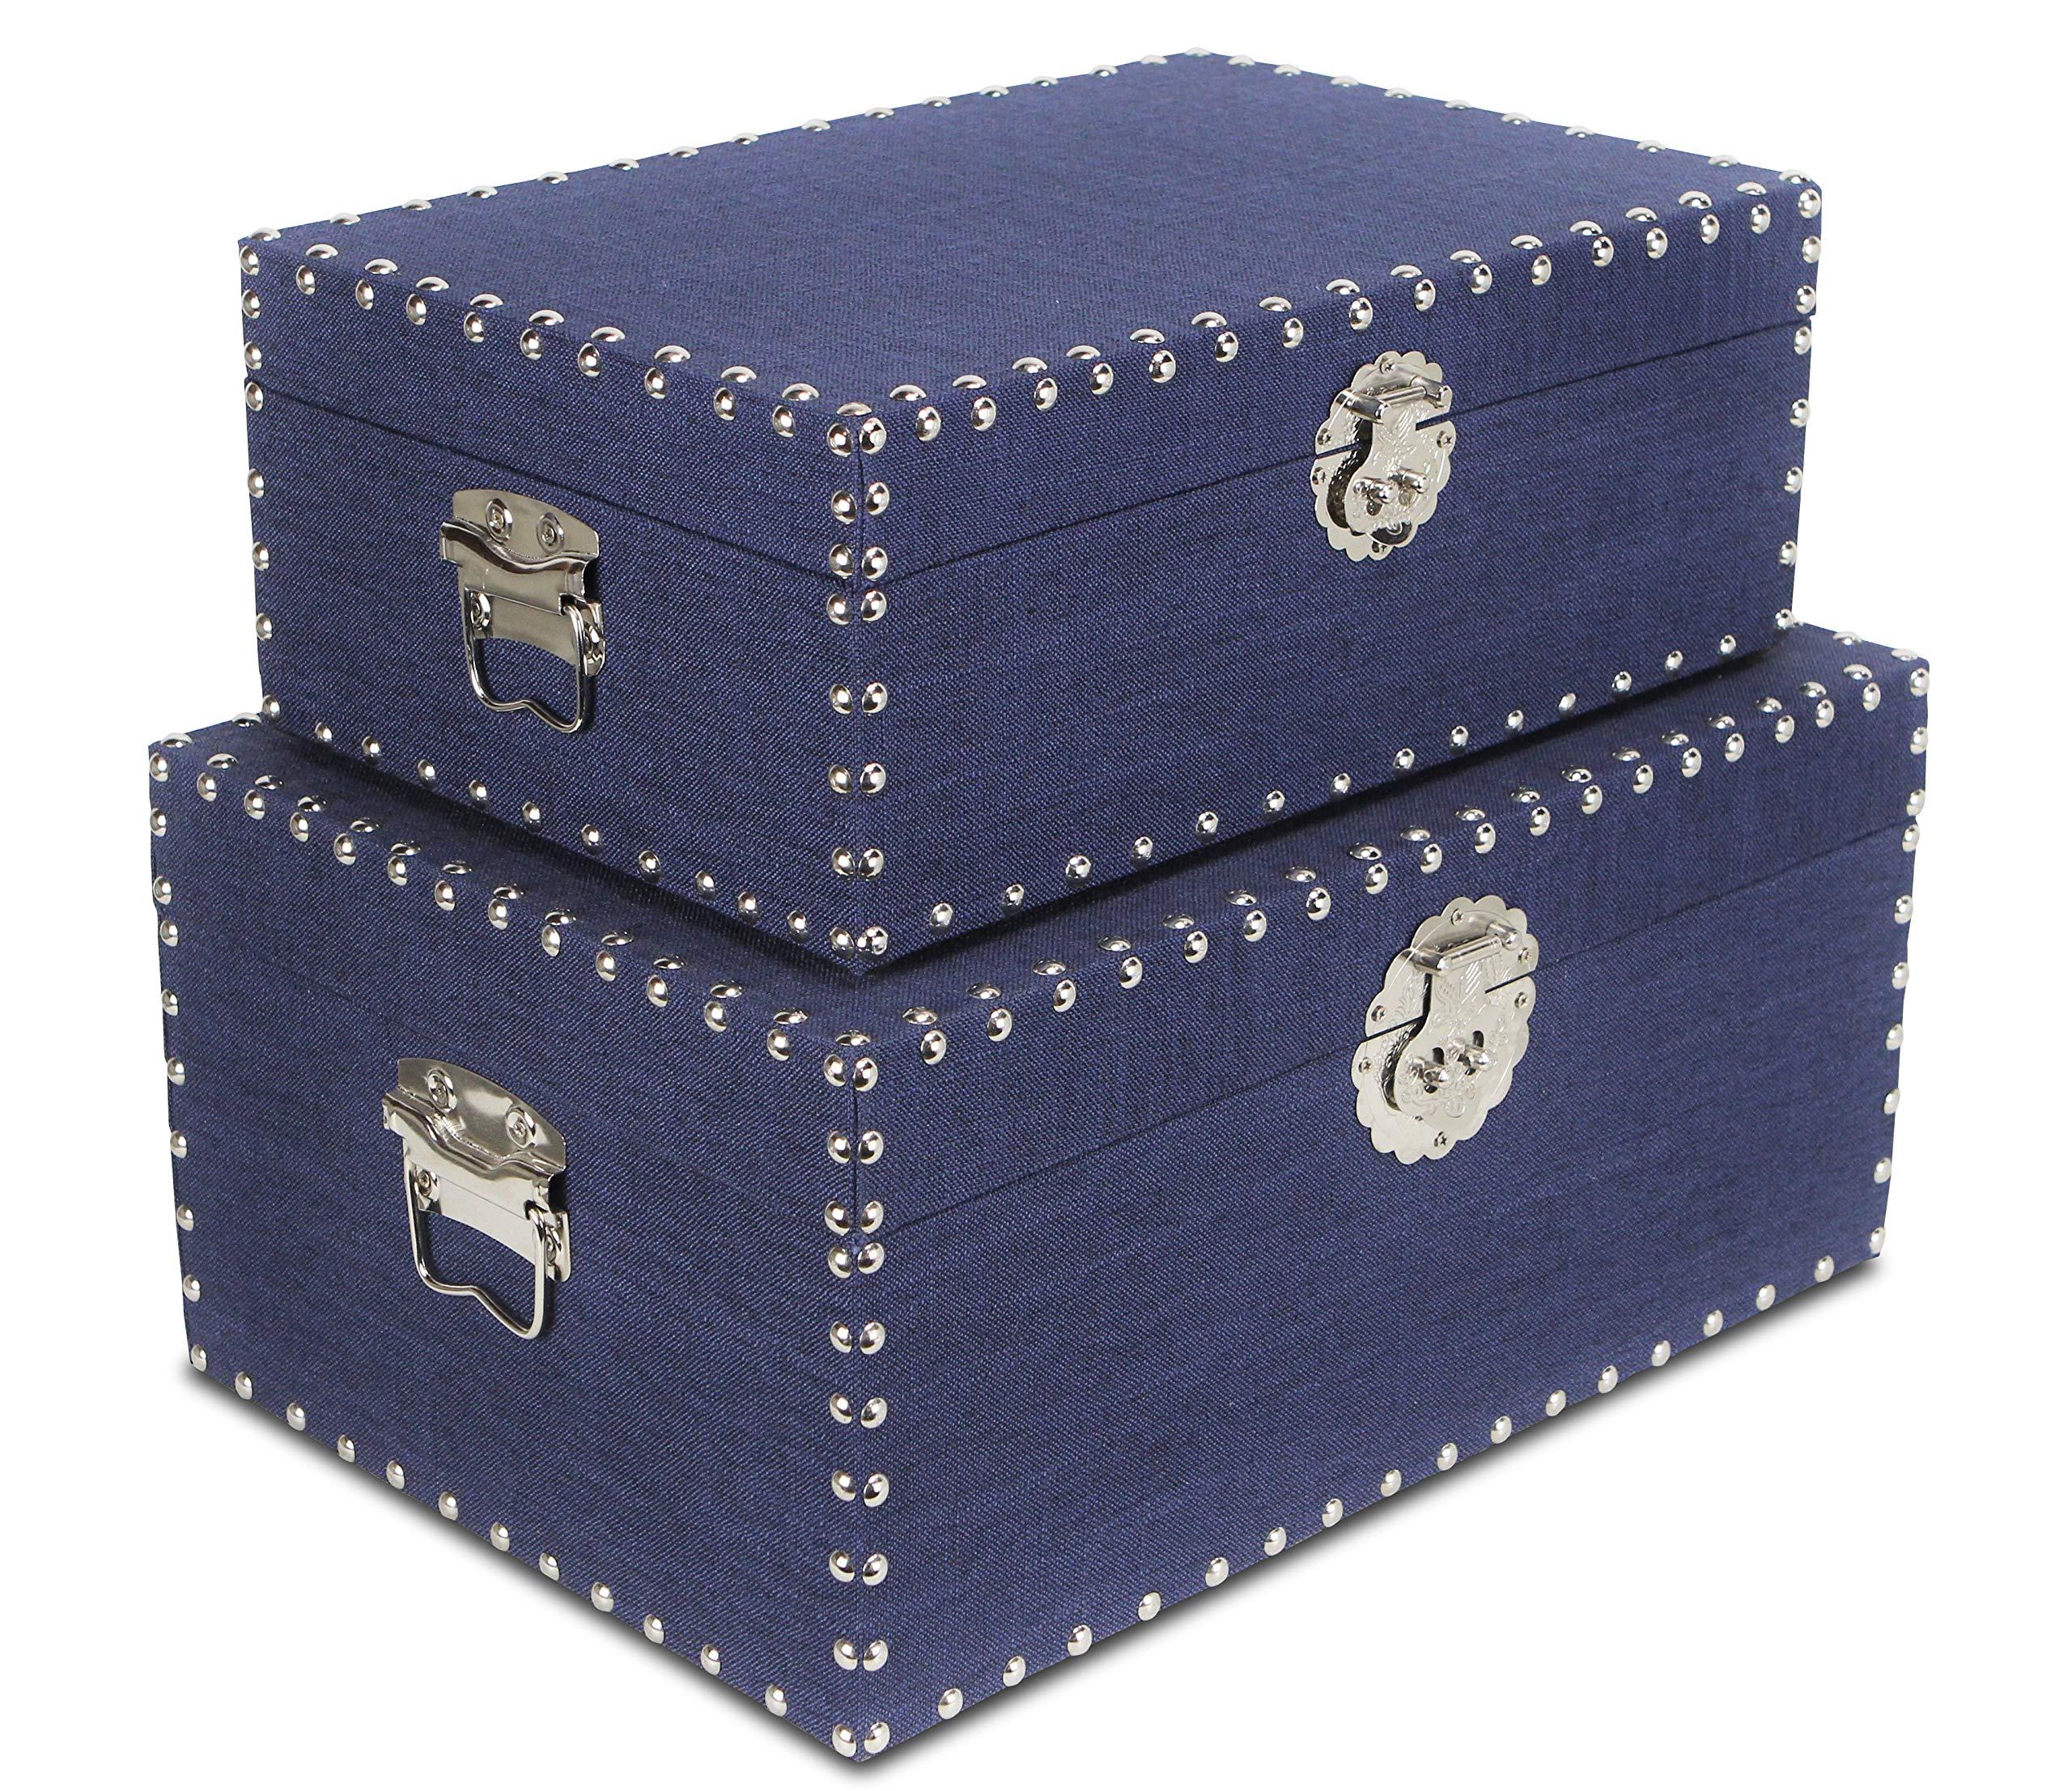 Zeckos Day of the Dead White Sugar Skull Dia De Los Muertos Mirrored Trinket Box Fantasy Gifts